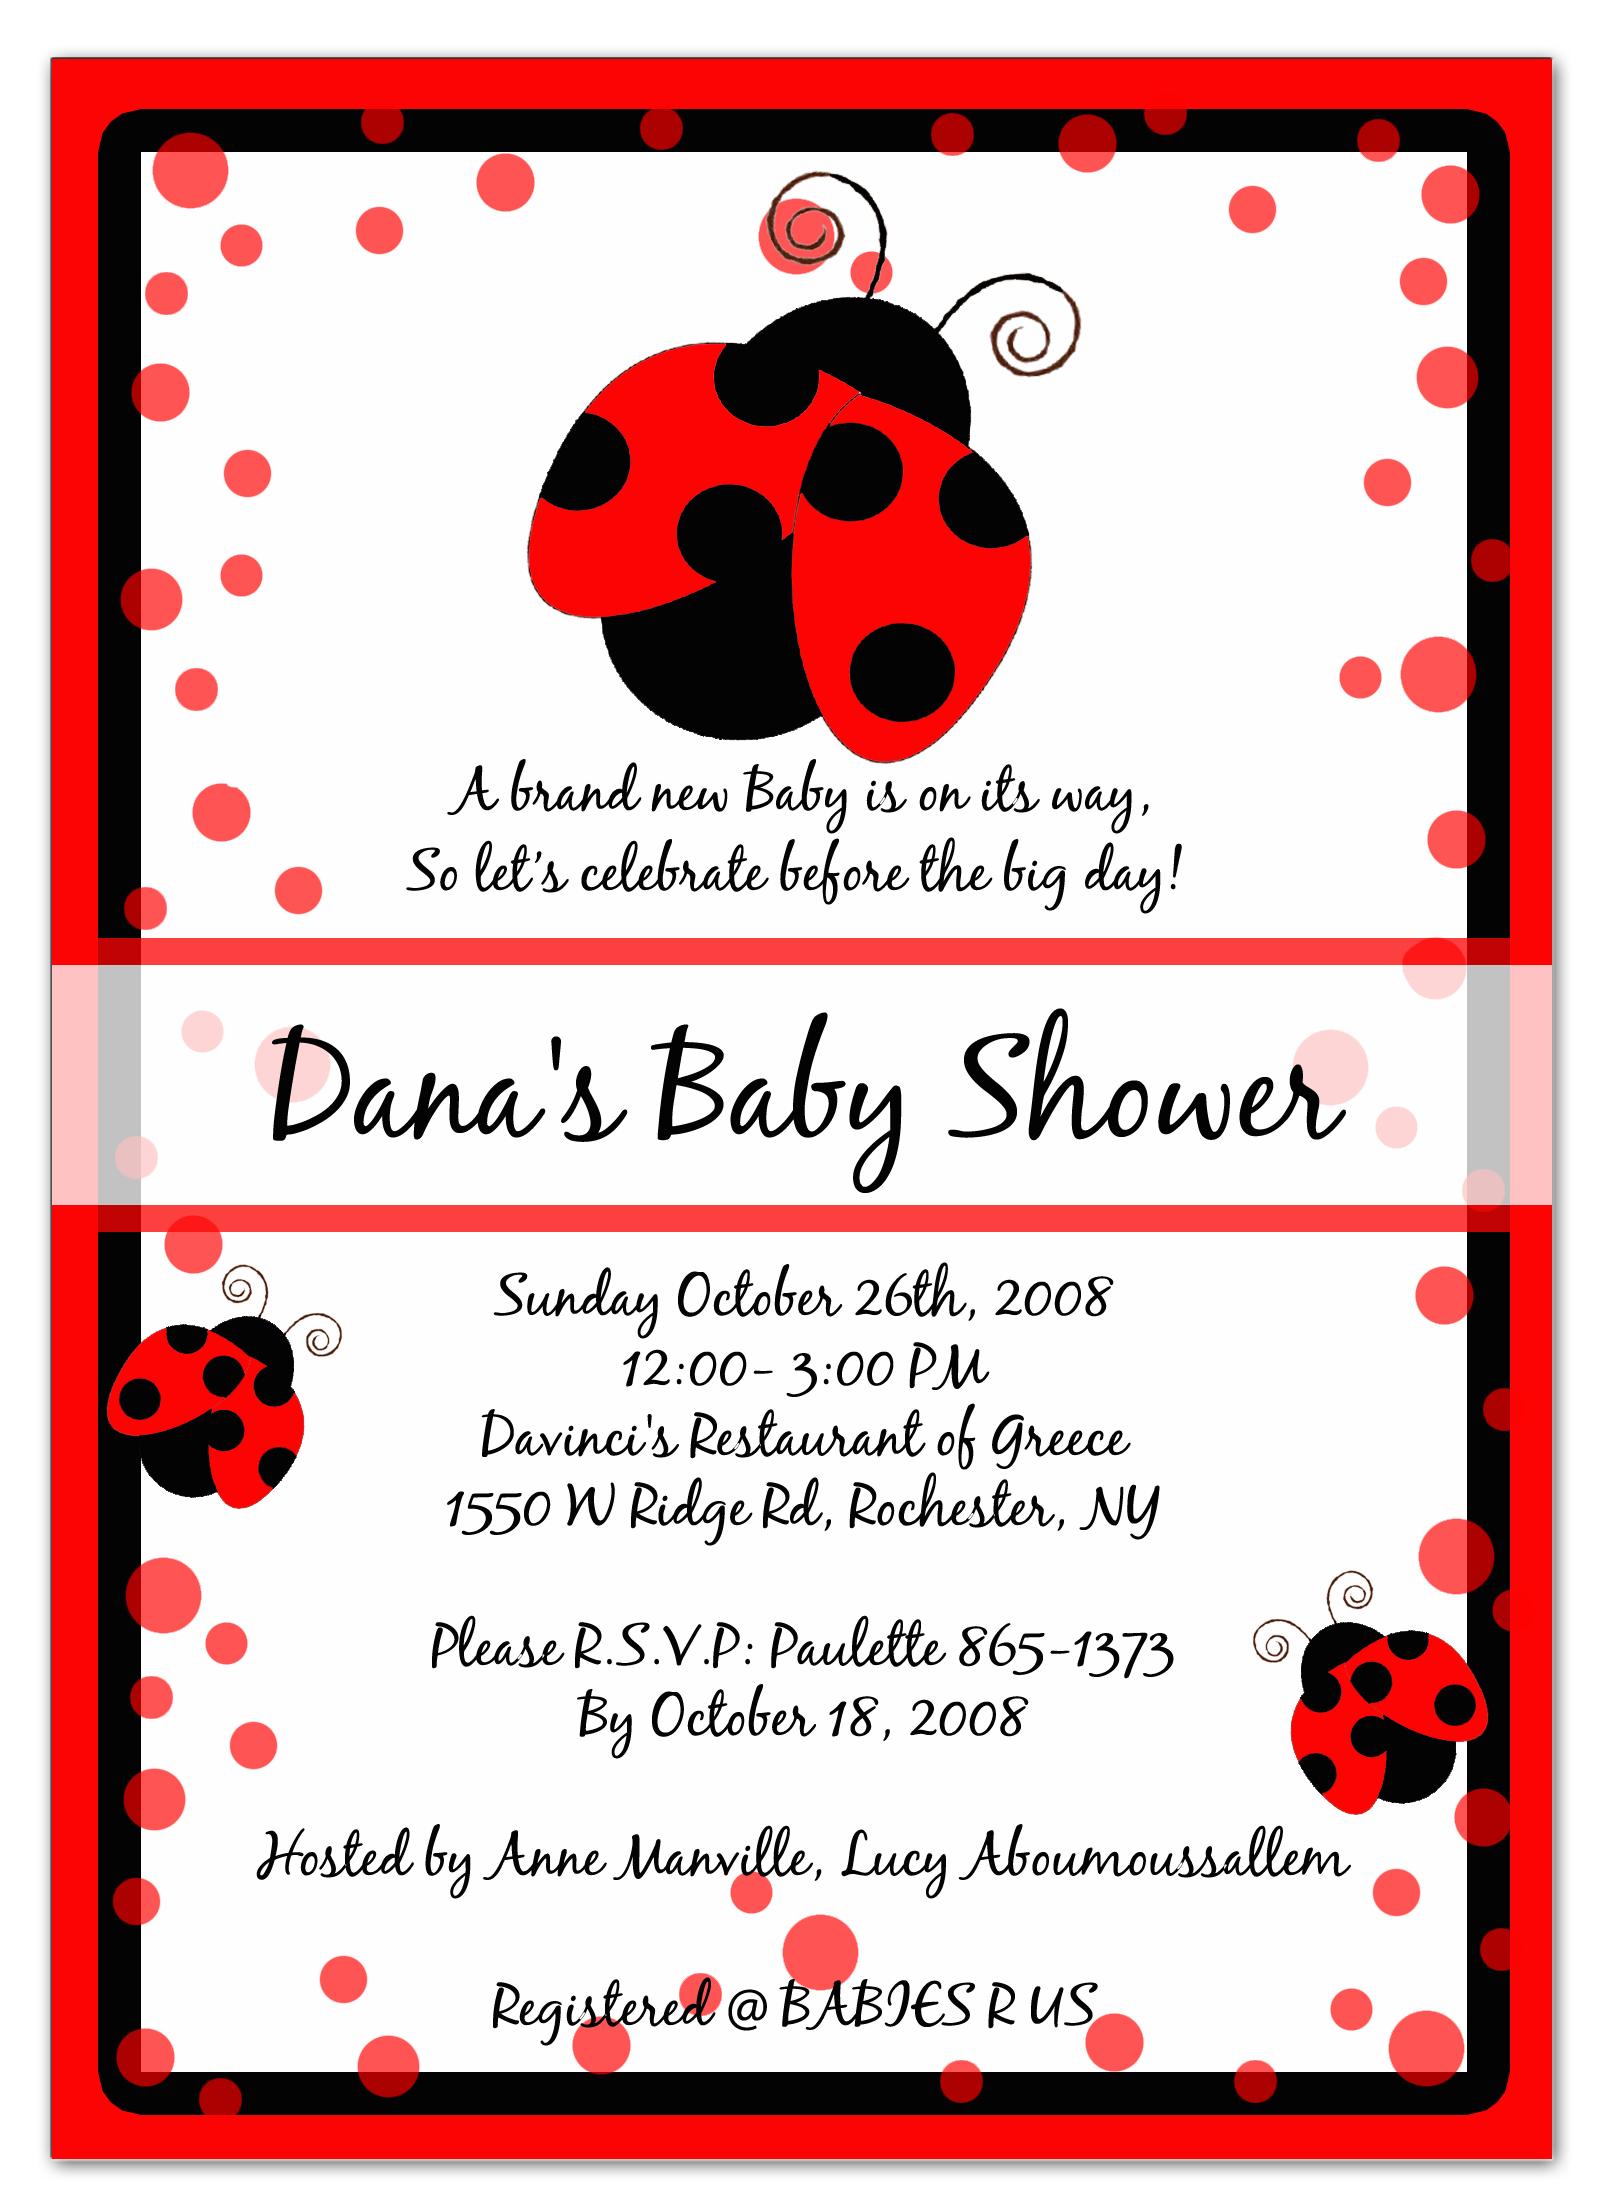 Photo : Cheap Sweet Pea Invitations Image - Free Printable Ladybug Baby Shower Invitations Templates